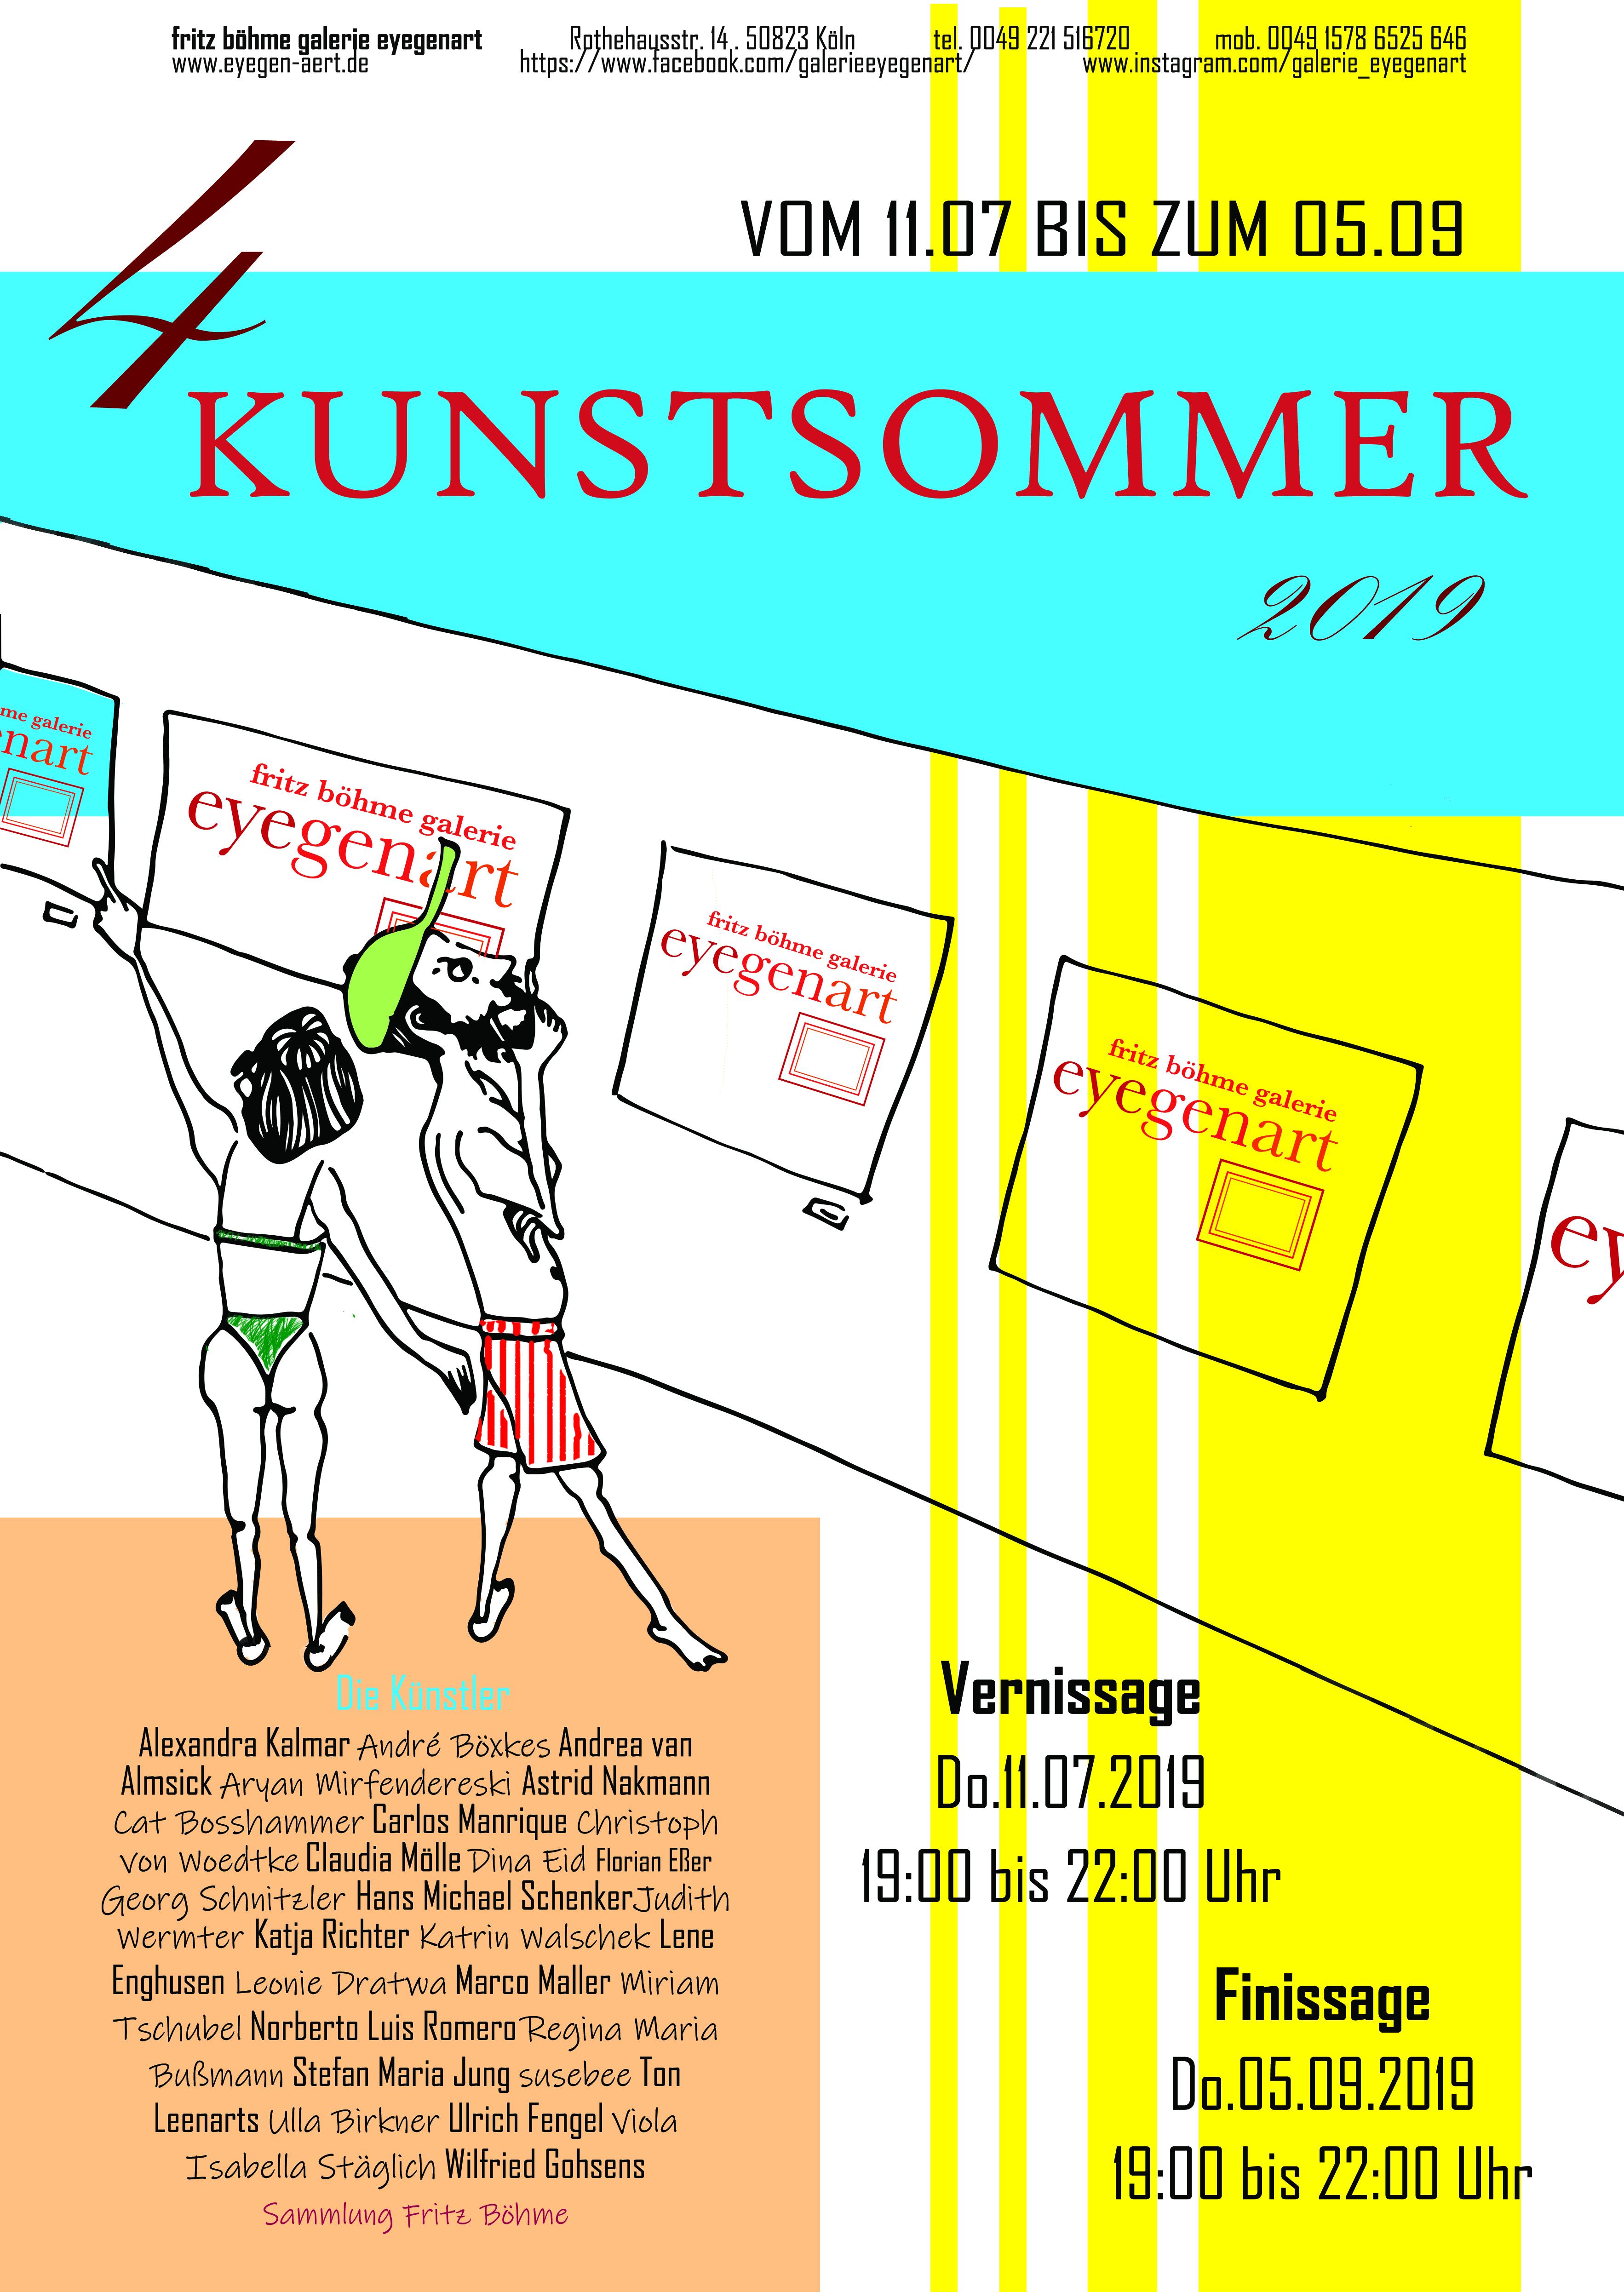 KUNSTSOMMER in der Galerie EYEGENART